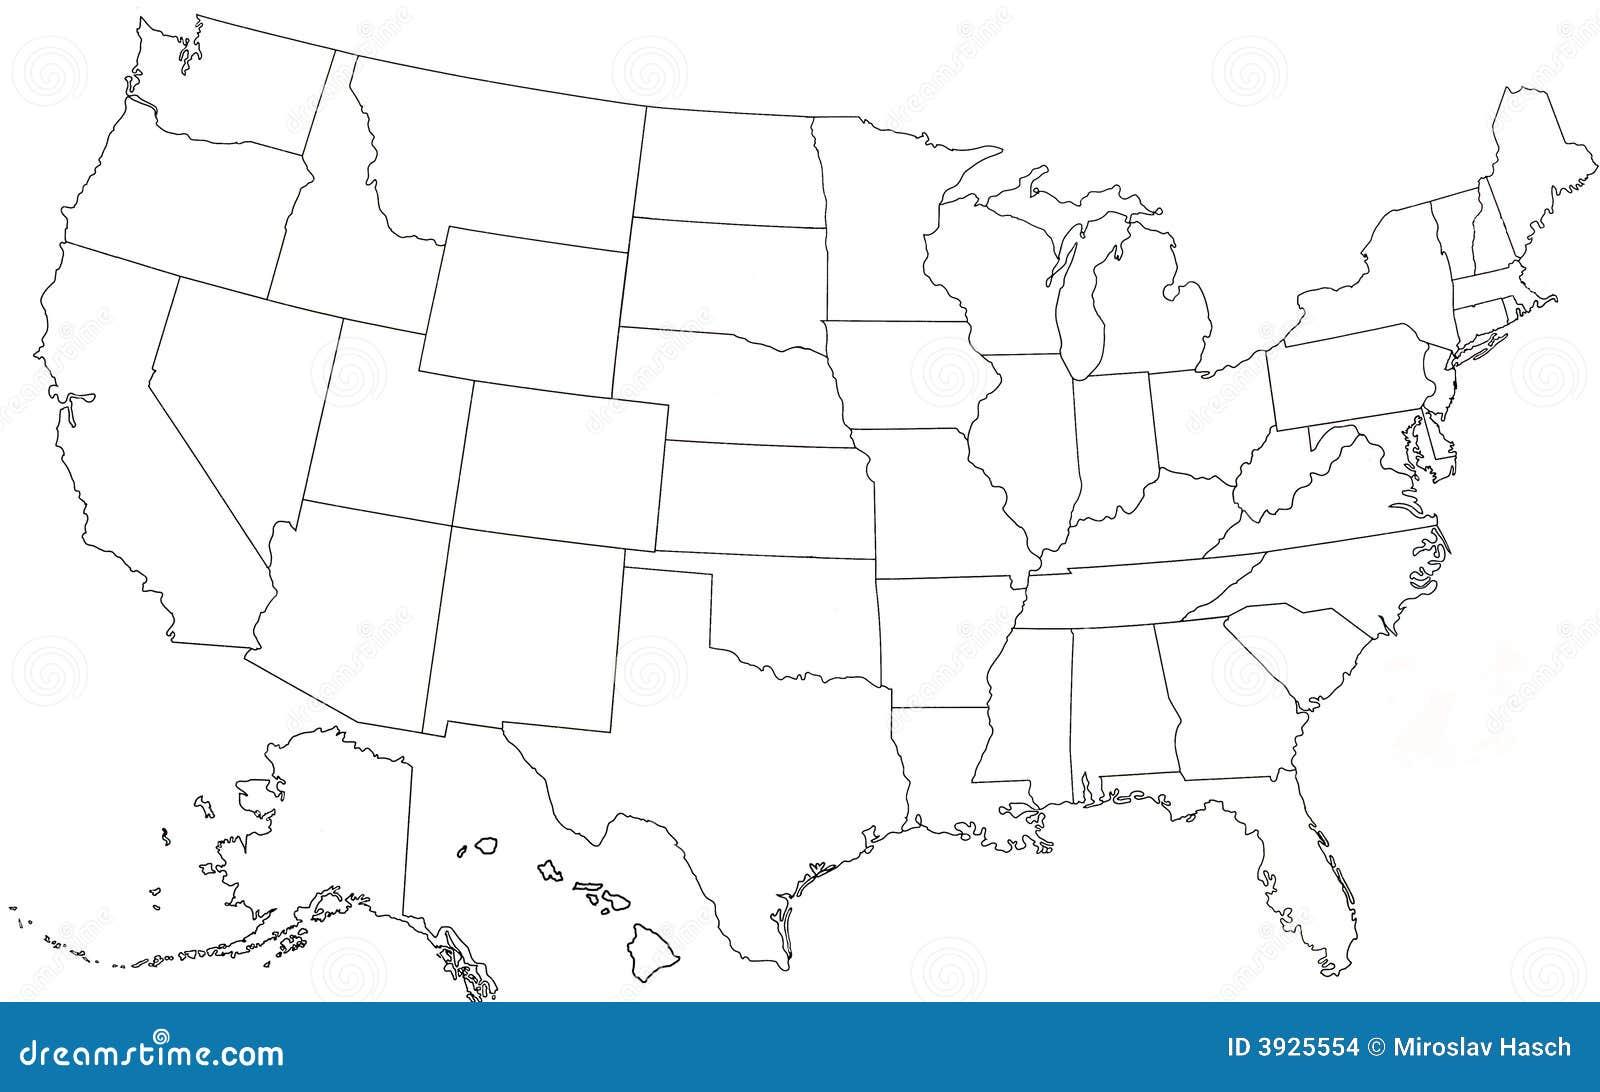 geographical map of arkansas with Imagens De Stock Mapa Dos Eua Image3925554 on Les 15 Plus Beaux Paysages Des Etats Unis besides Colorado moreover Green River  Colorado River likewise Geography of Arkansas together with Imagens De Stock Mapa Dos Eua Image3925554.